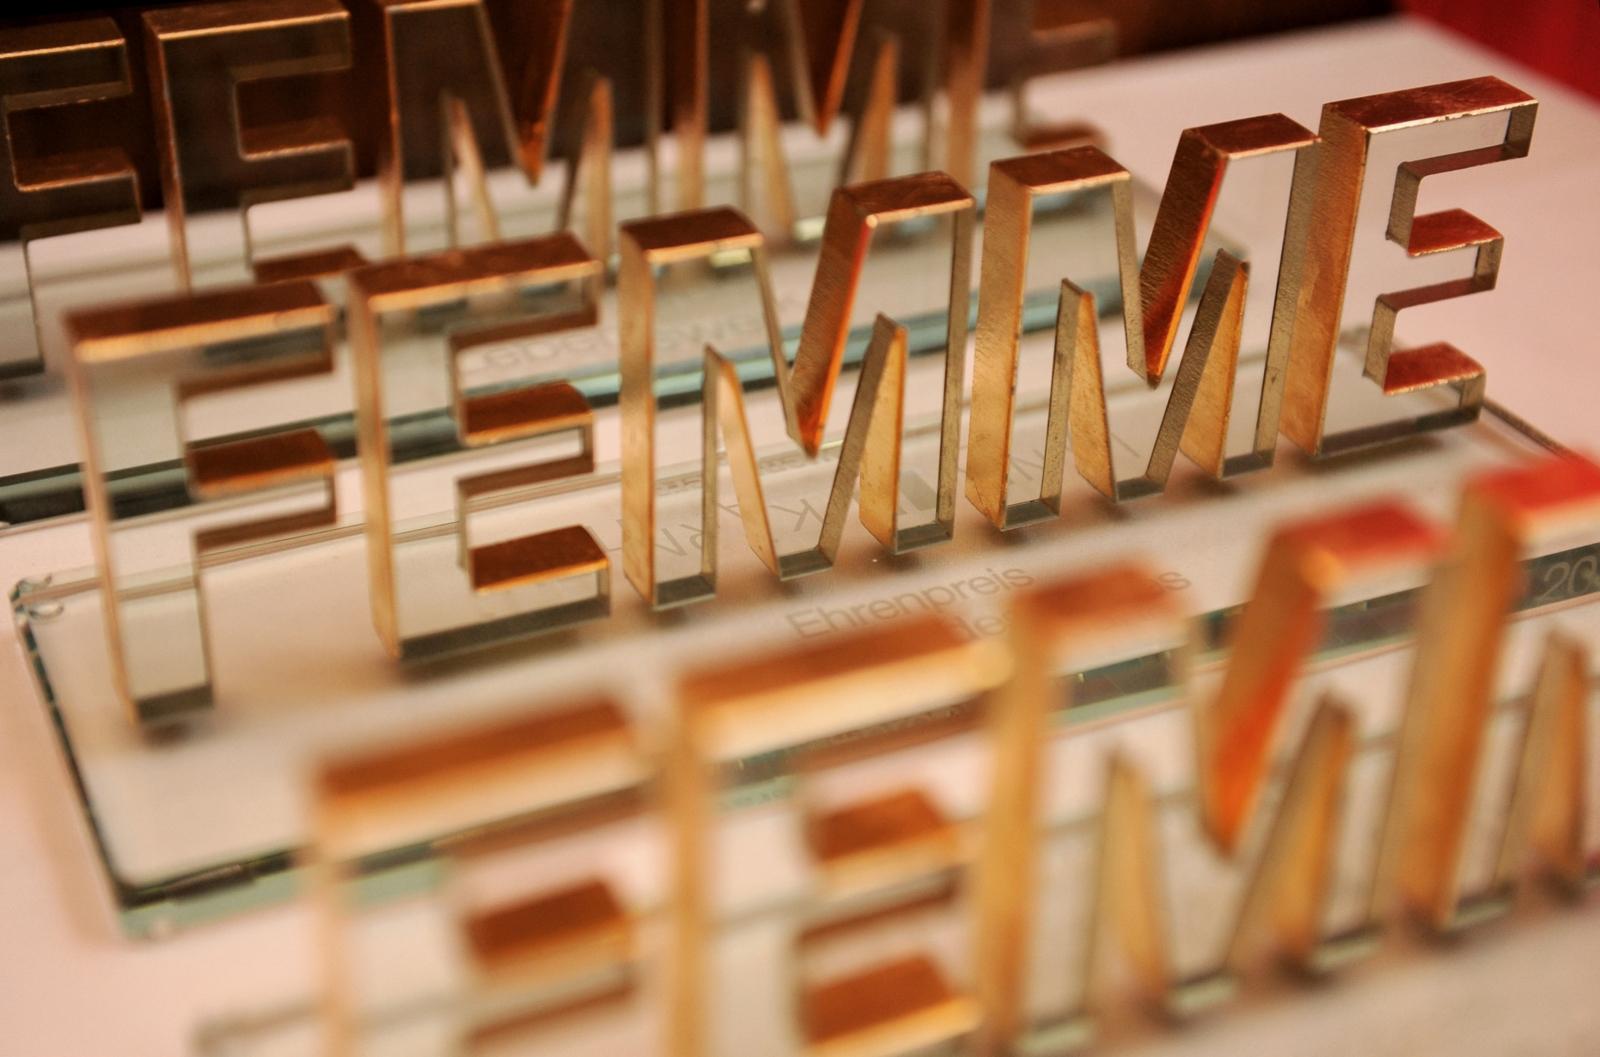 Femme 2018: Kärntner Frauenpreis